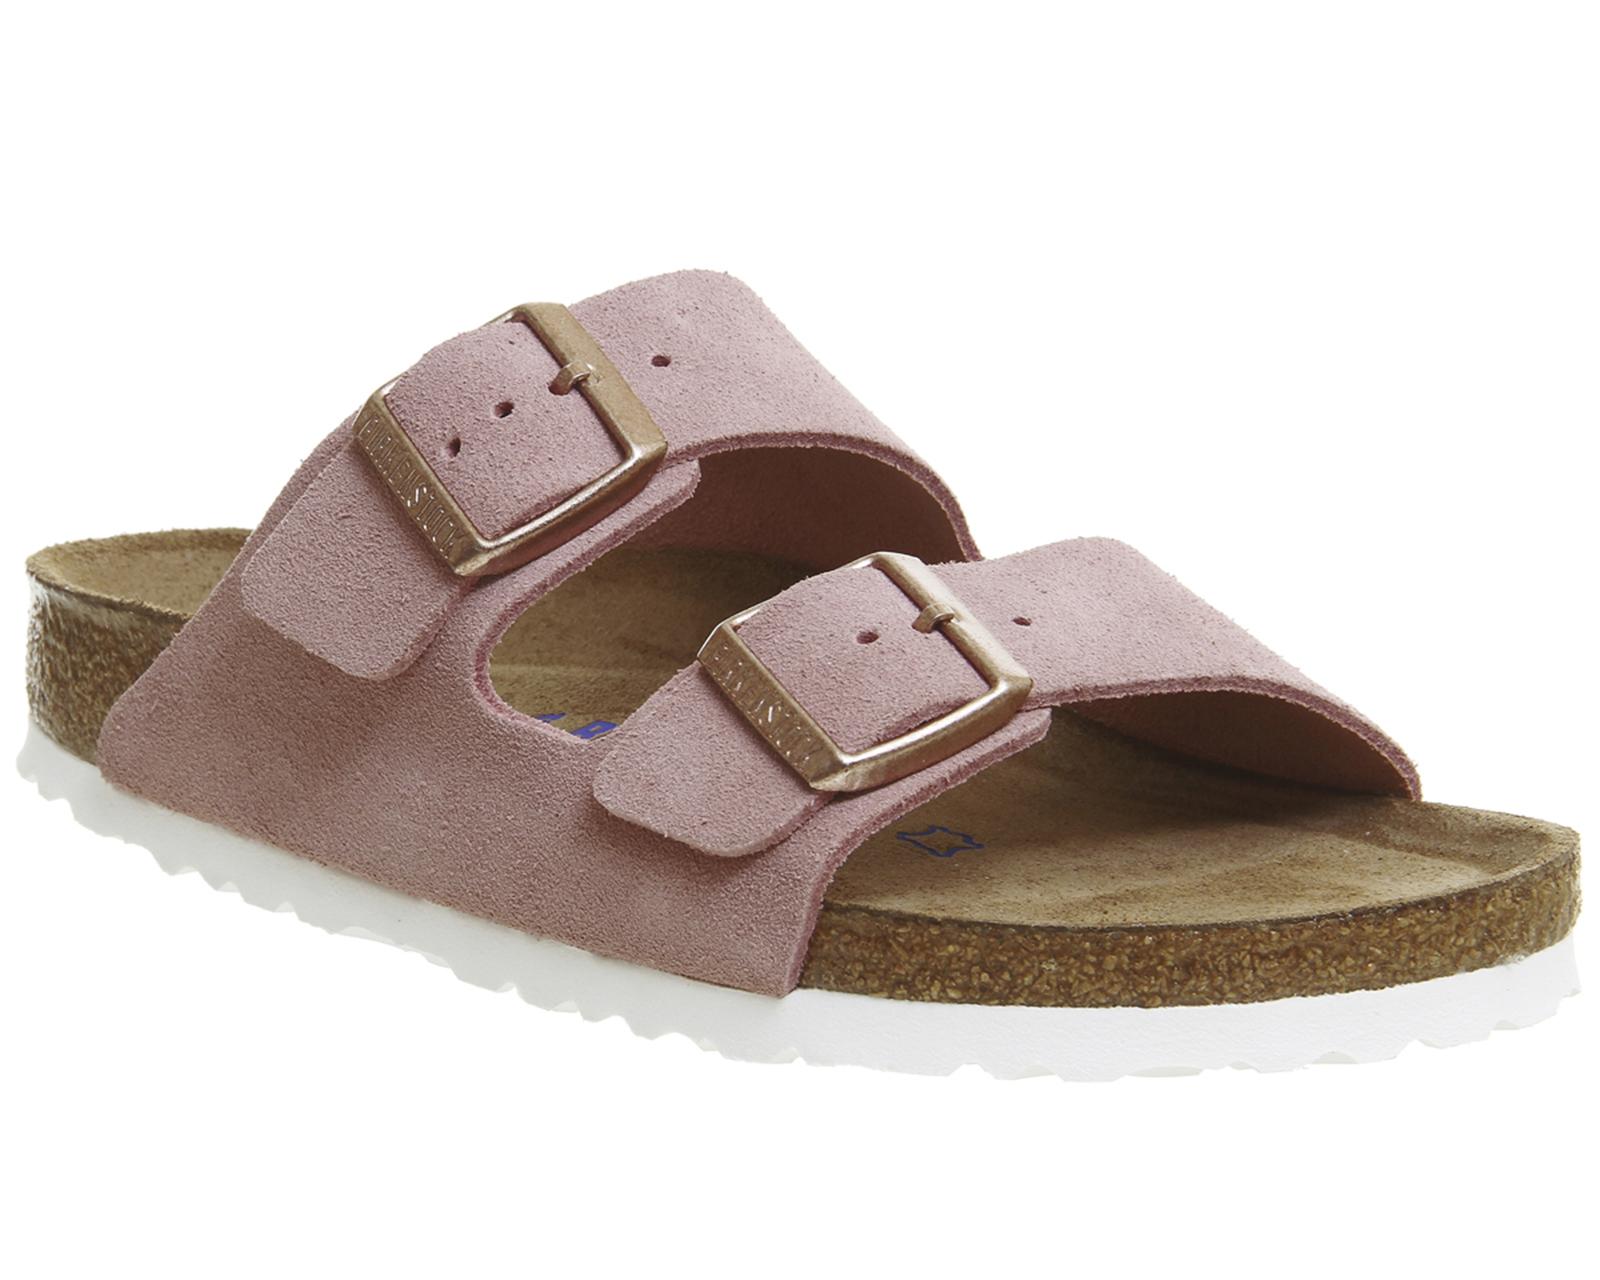 ede354cf408f Sentinel Womens Birkenstock Arizona Two Strap Sandals Rose Suede Sandals